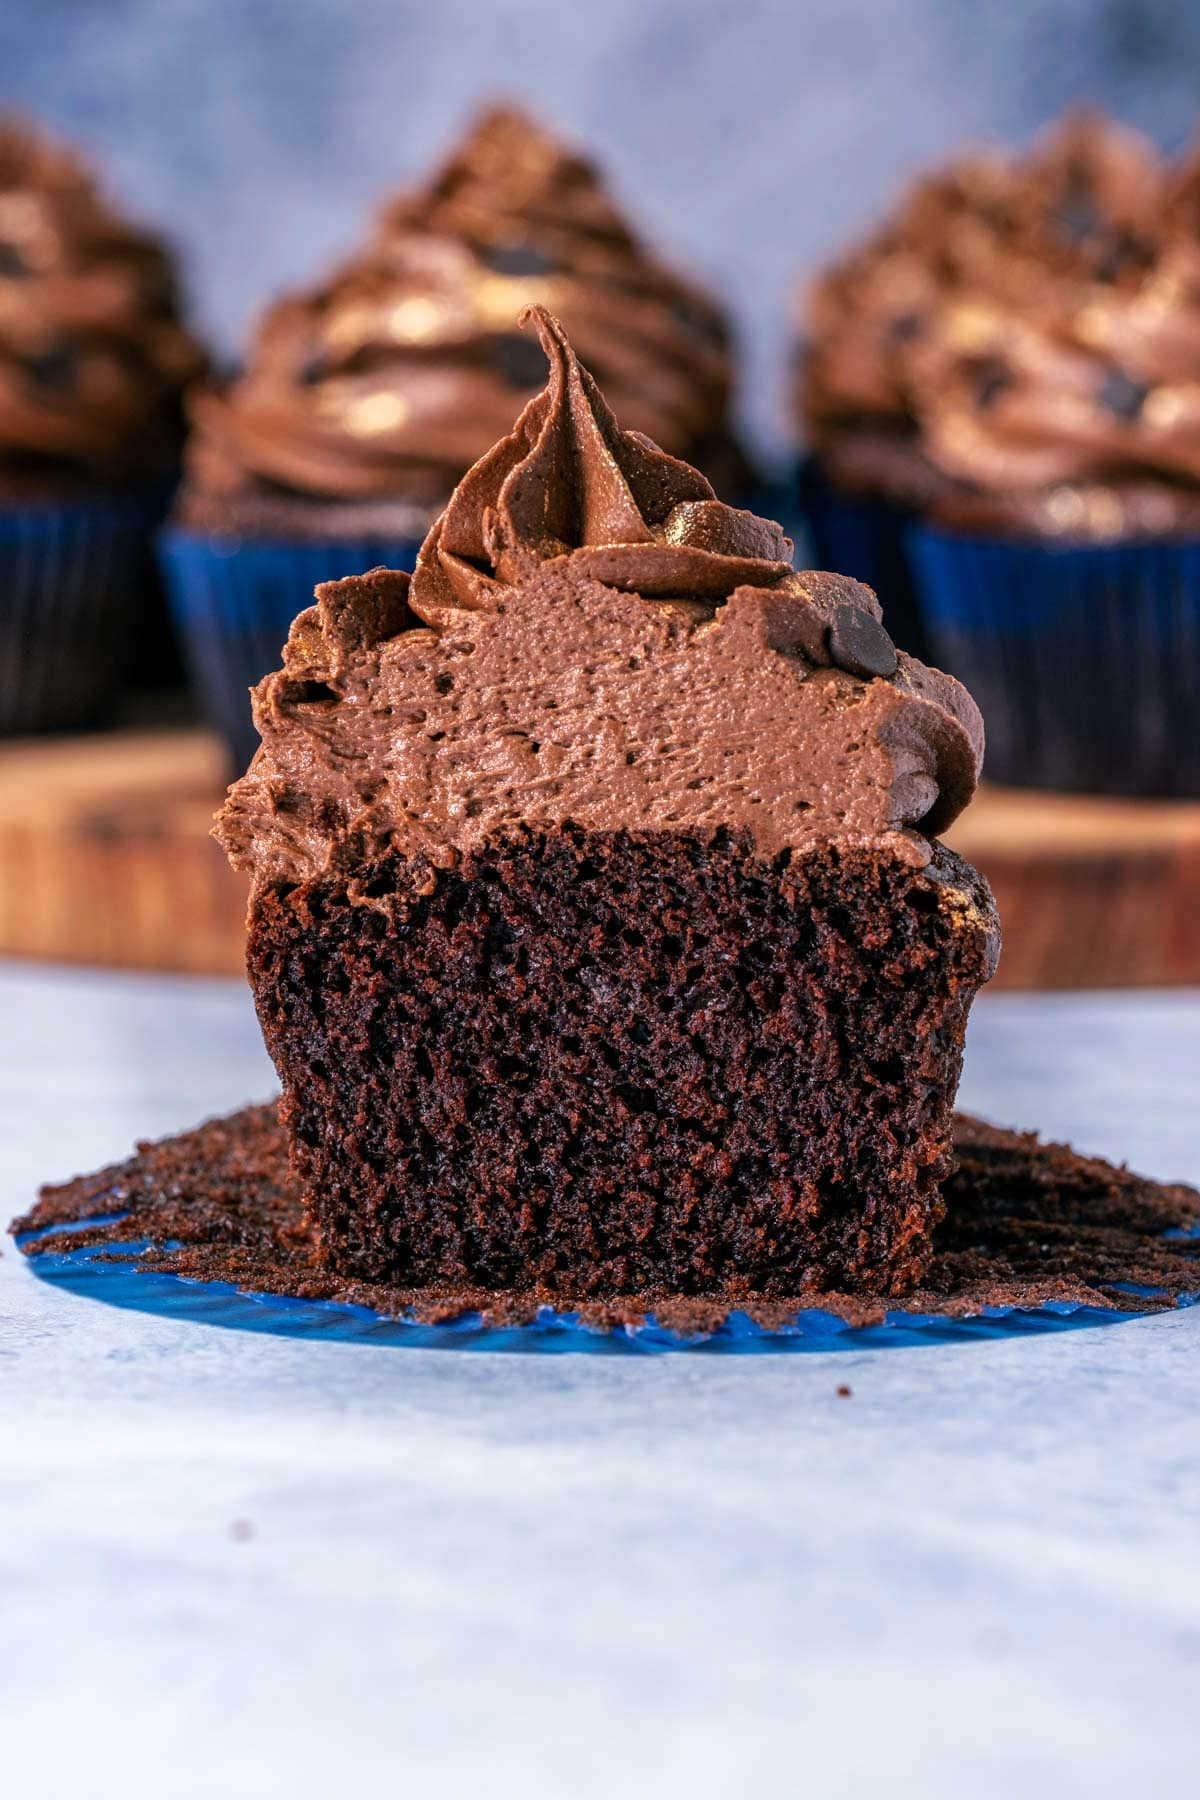 Eggless chocolate cupcake cut in half.